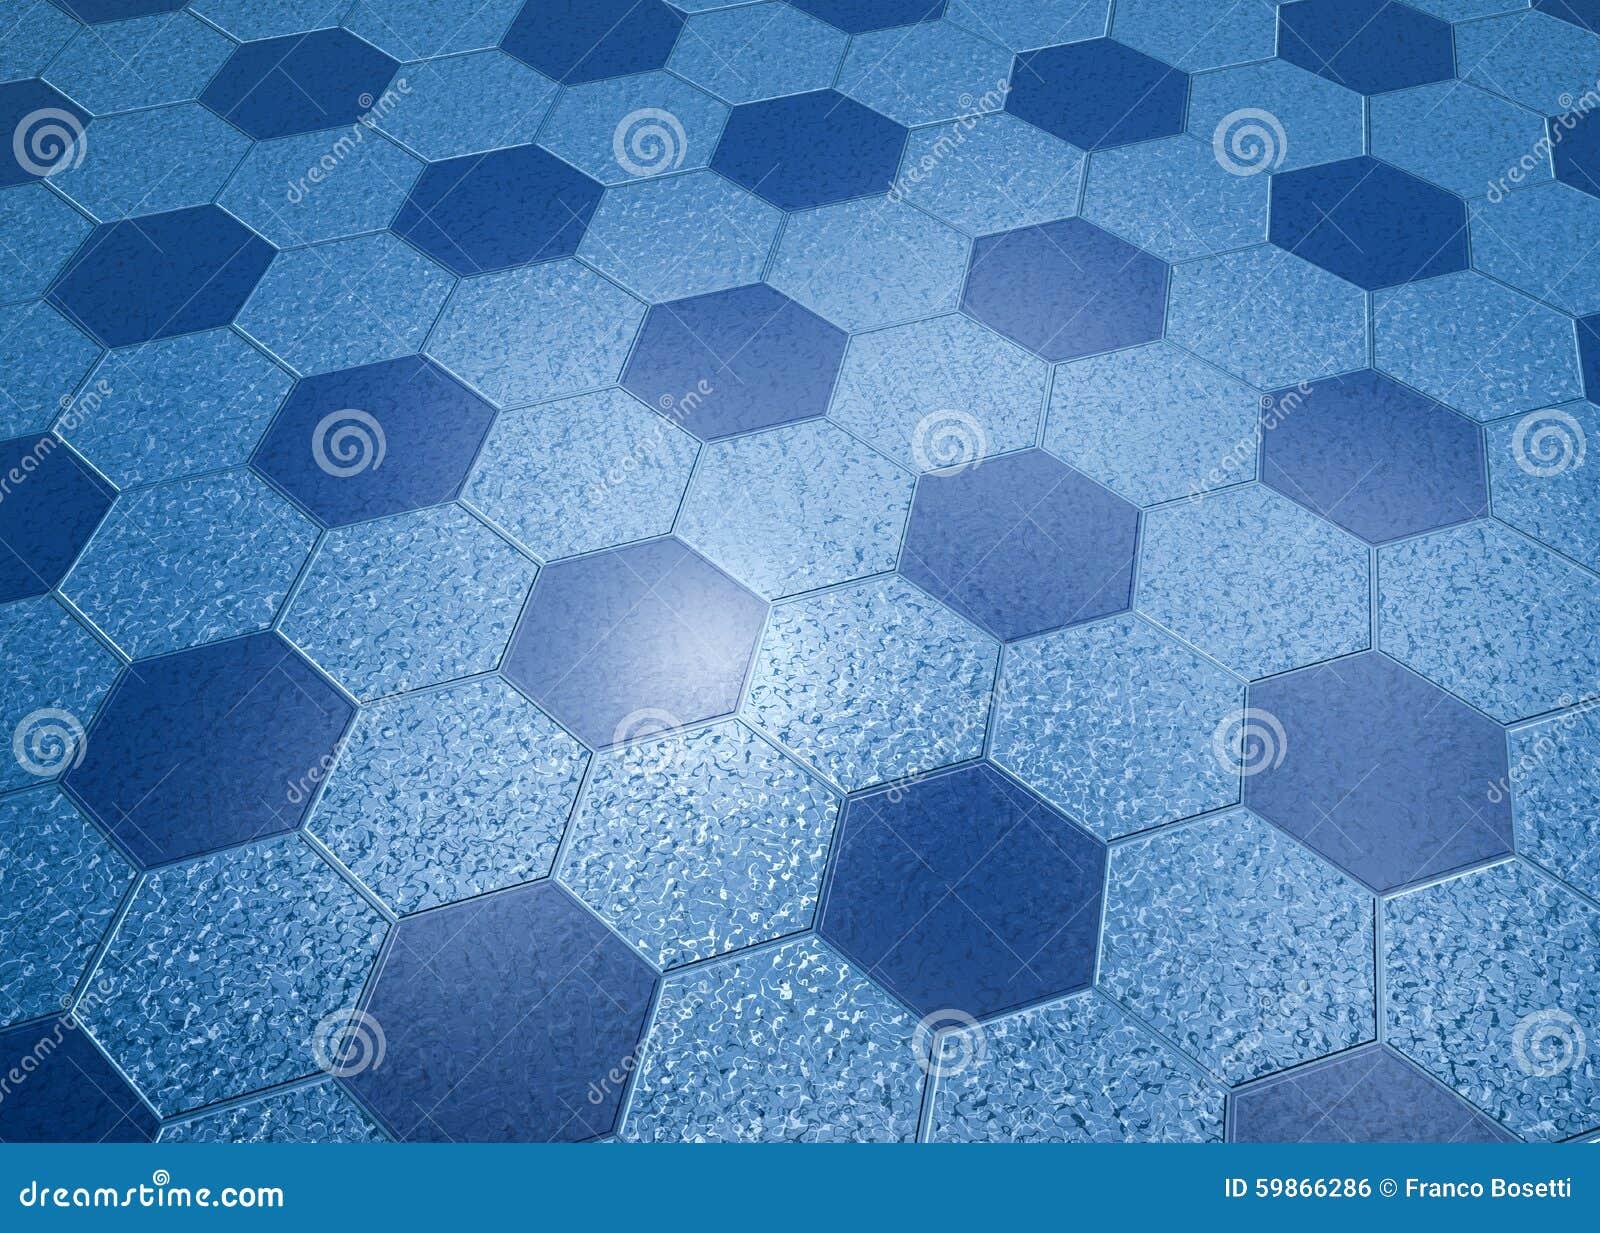 Bagno con mattonelle esagonali bagno con piastrelle esagonali cir